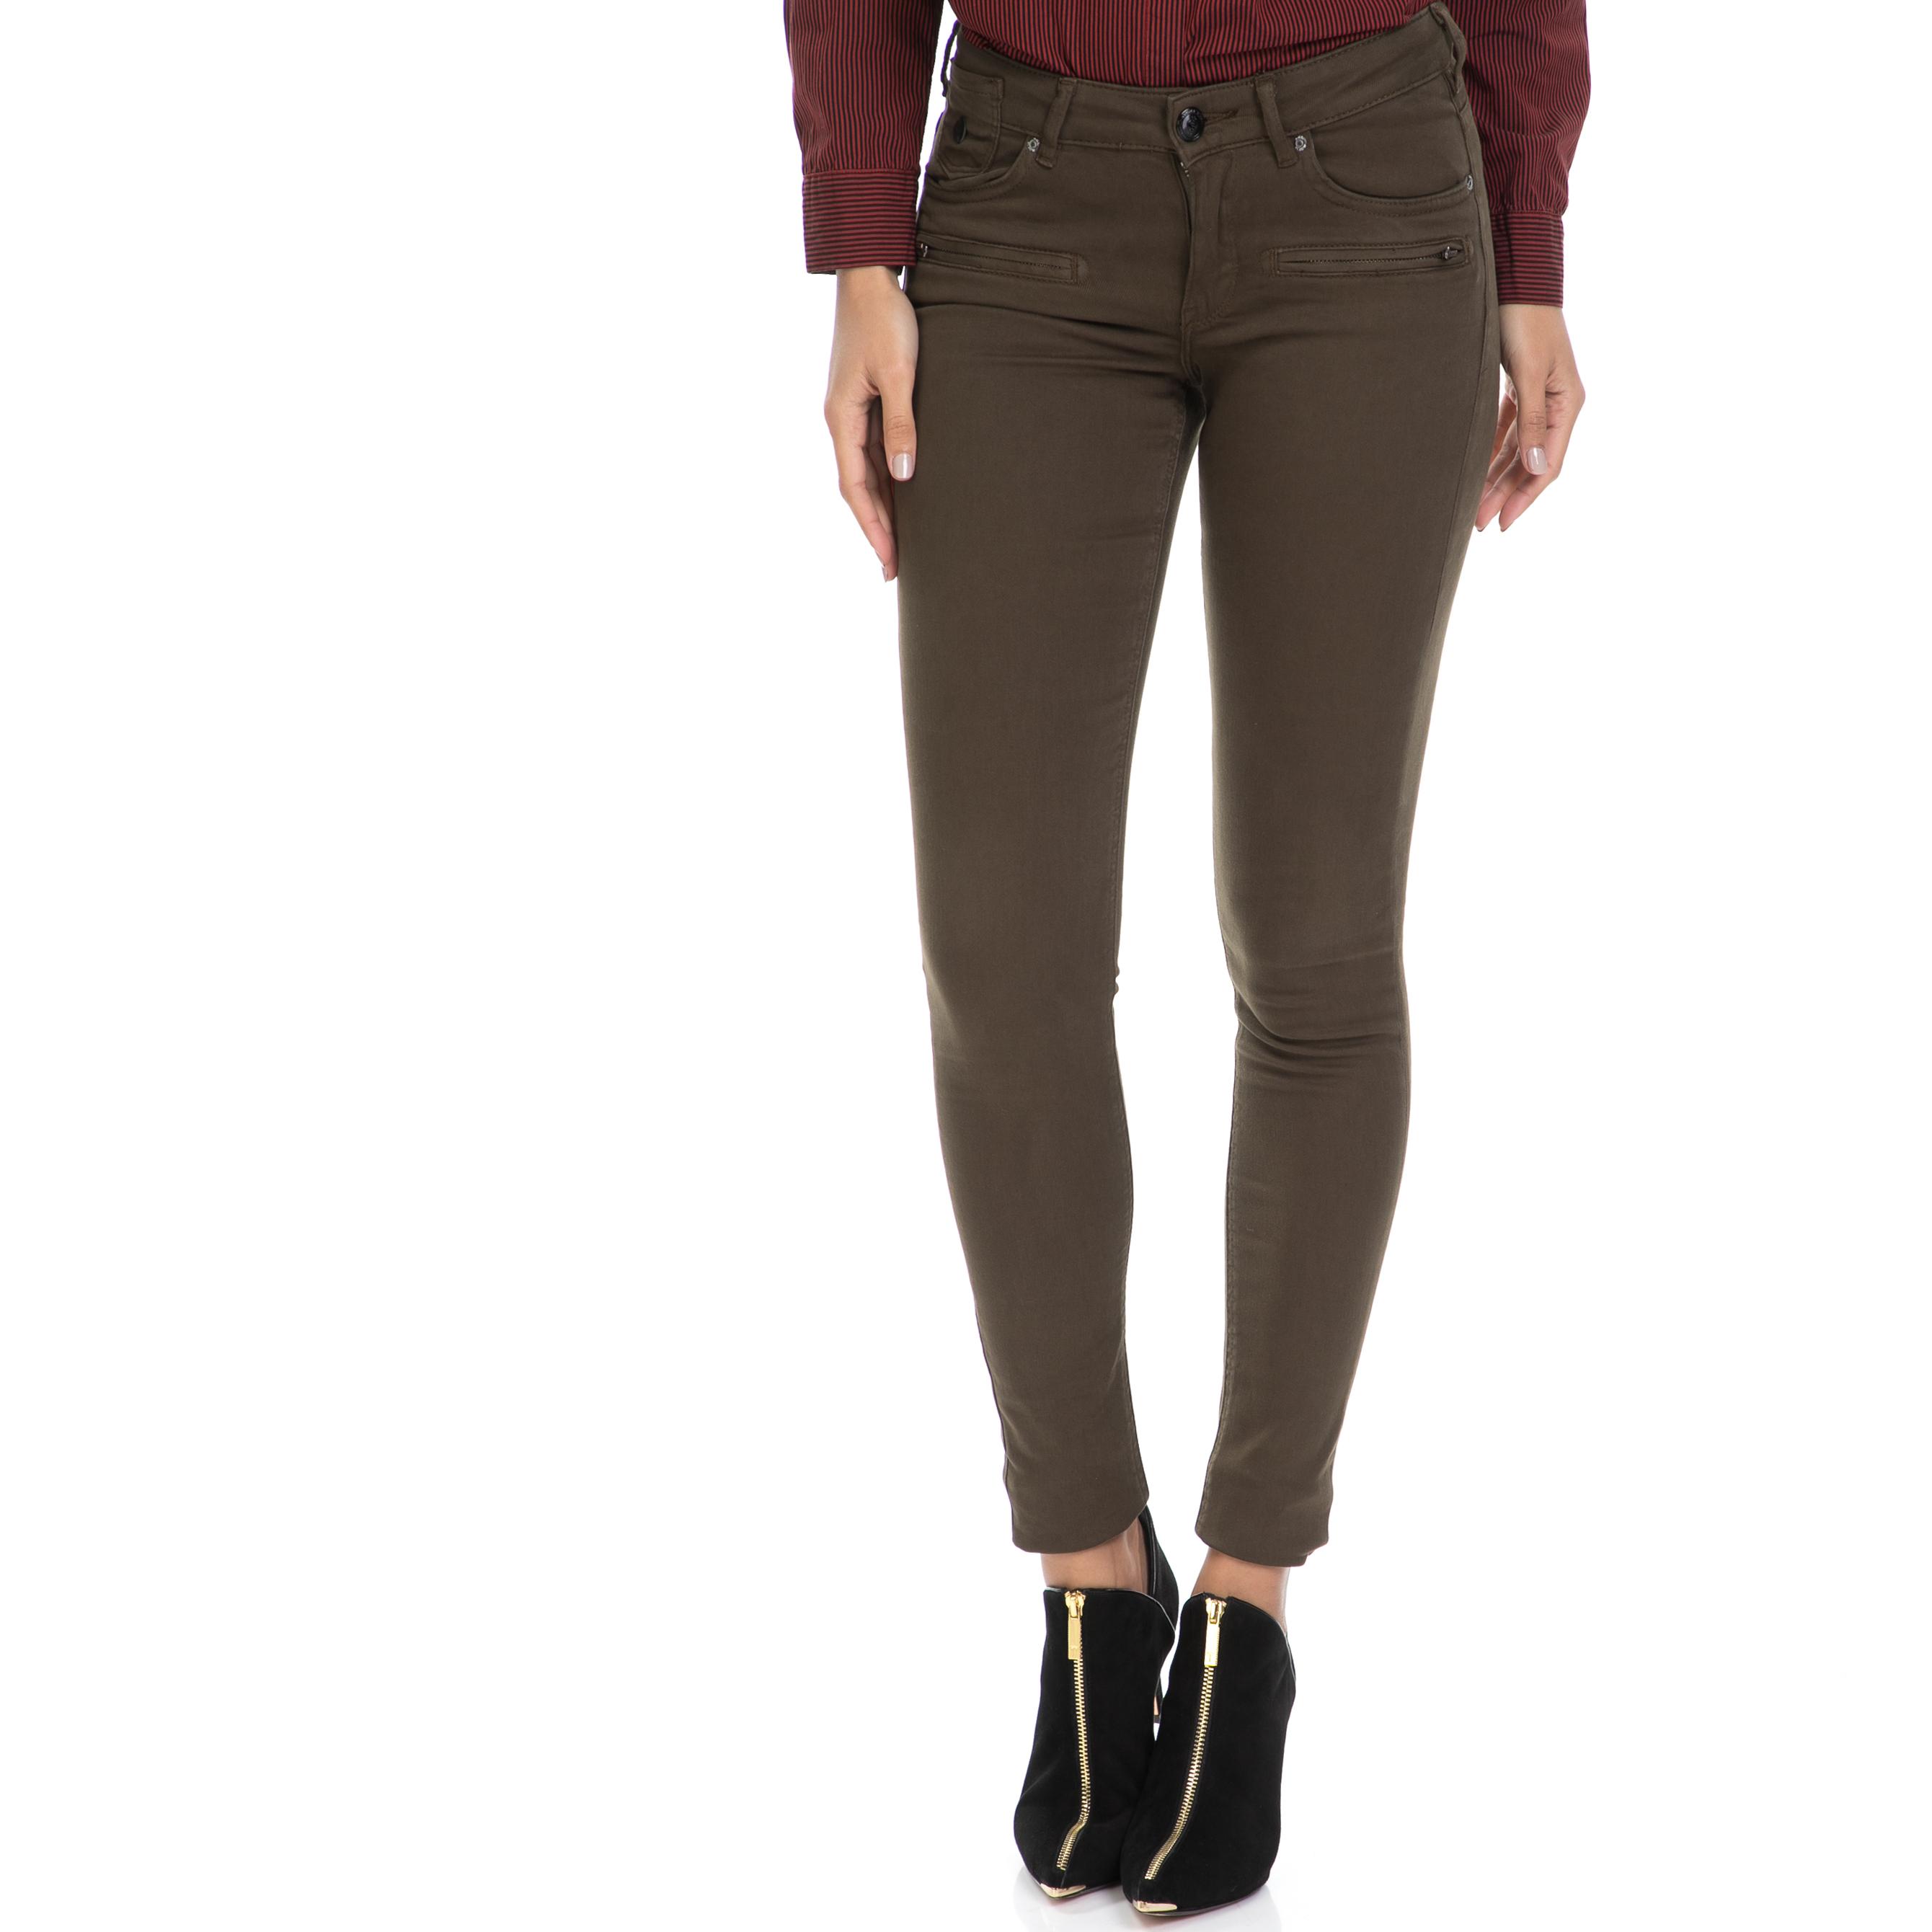 SCOTCH   SODA – Γυναικείο τζιν παντελόνι La Parisienne Zip – La Luna SCOTCH    SODA 3ffb6a40d32